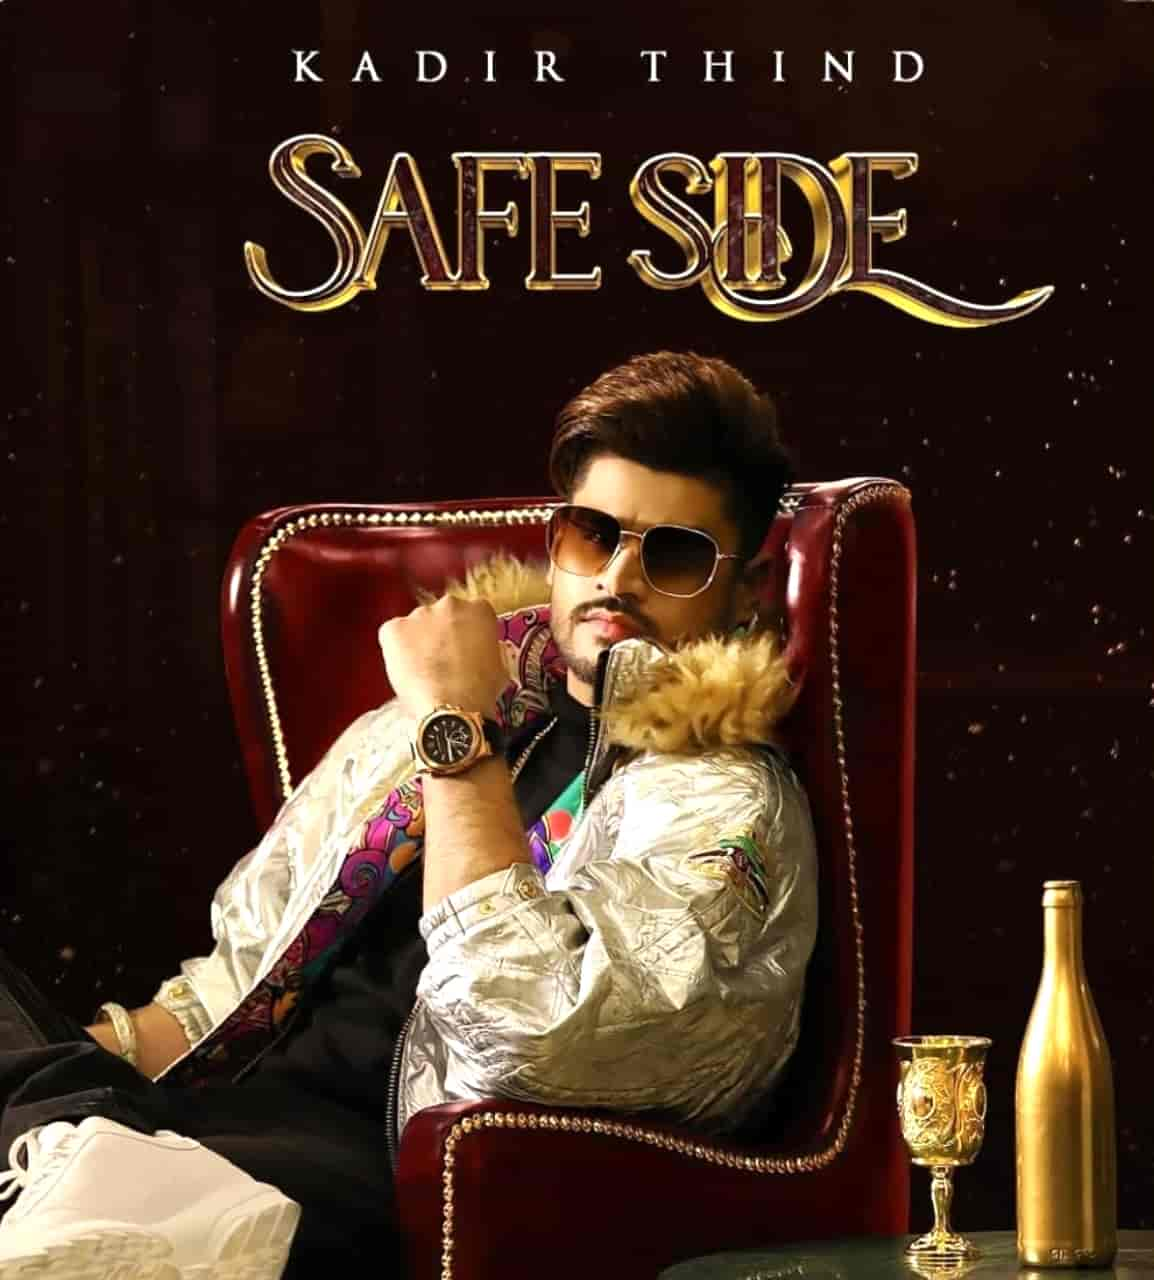 Safe Side Punjabi Song Image Features Kadir Thind